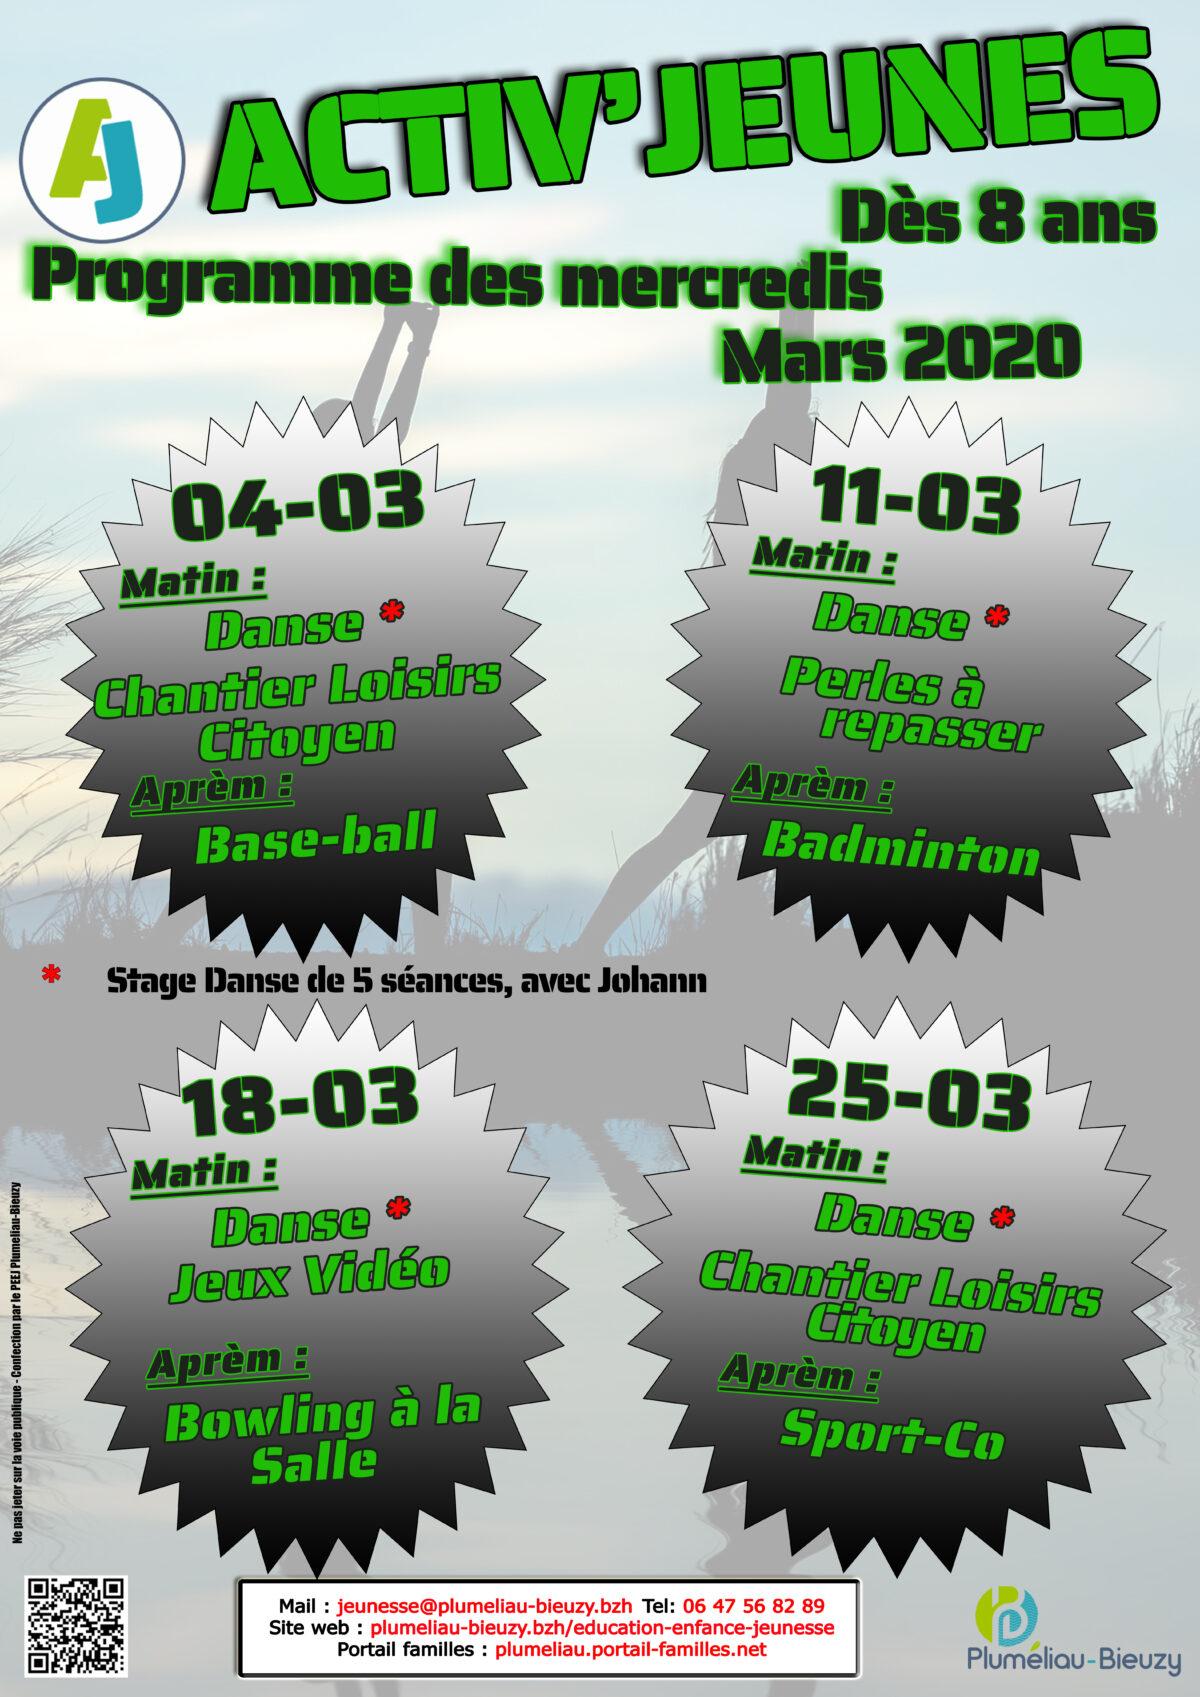 Programme des mercredis de mars 2020